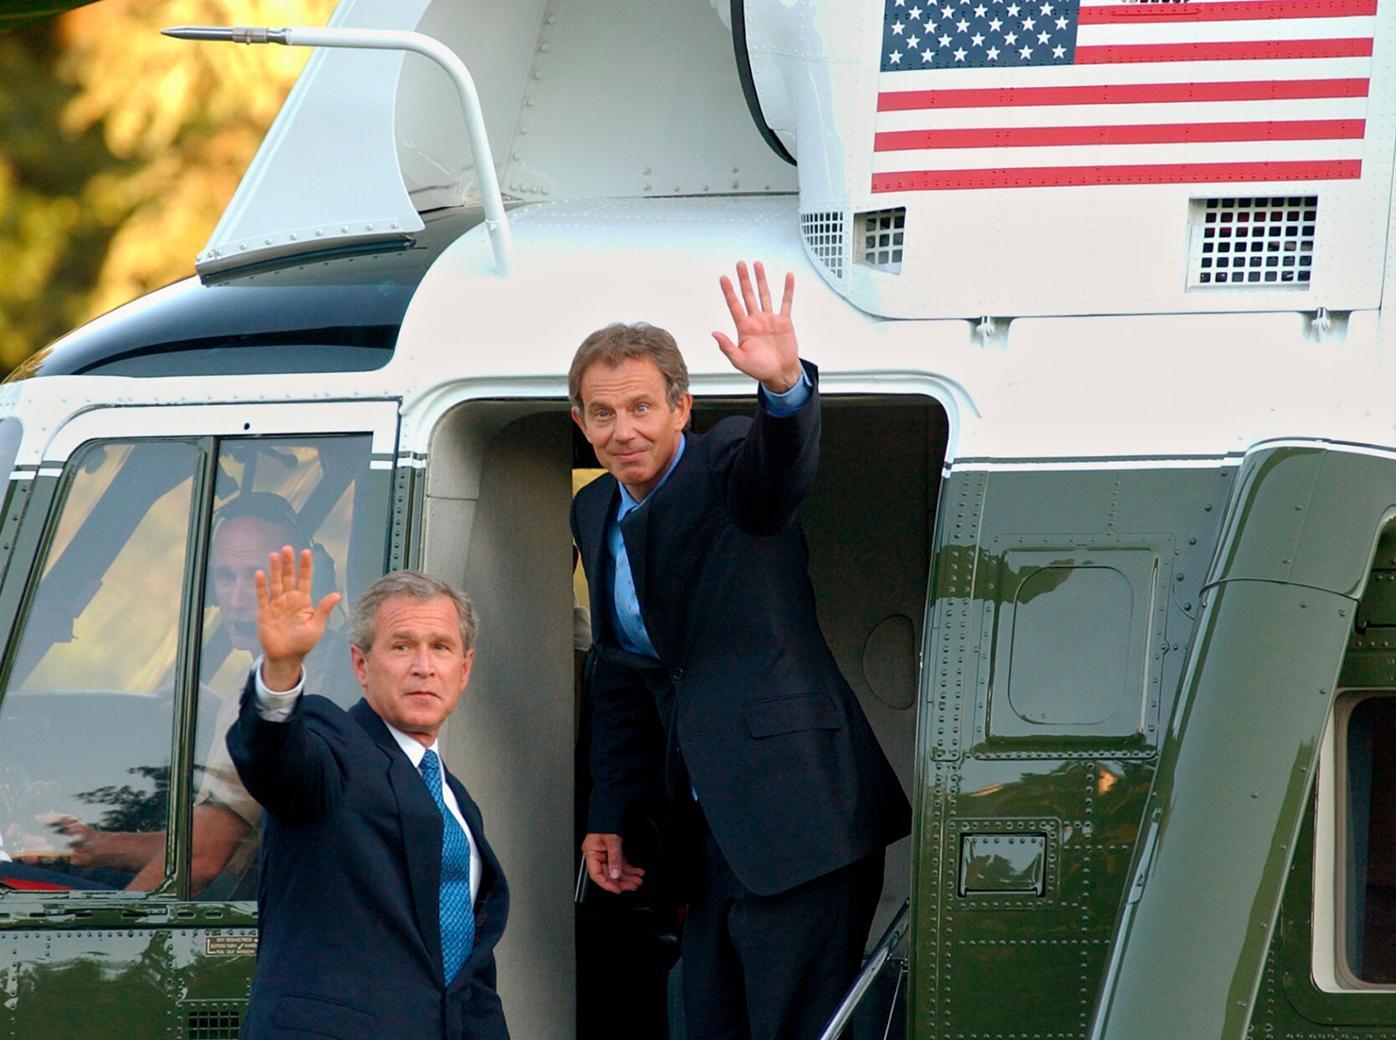 President Bush and British Prime Minister Tony Blair wave